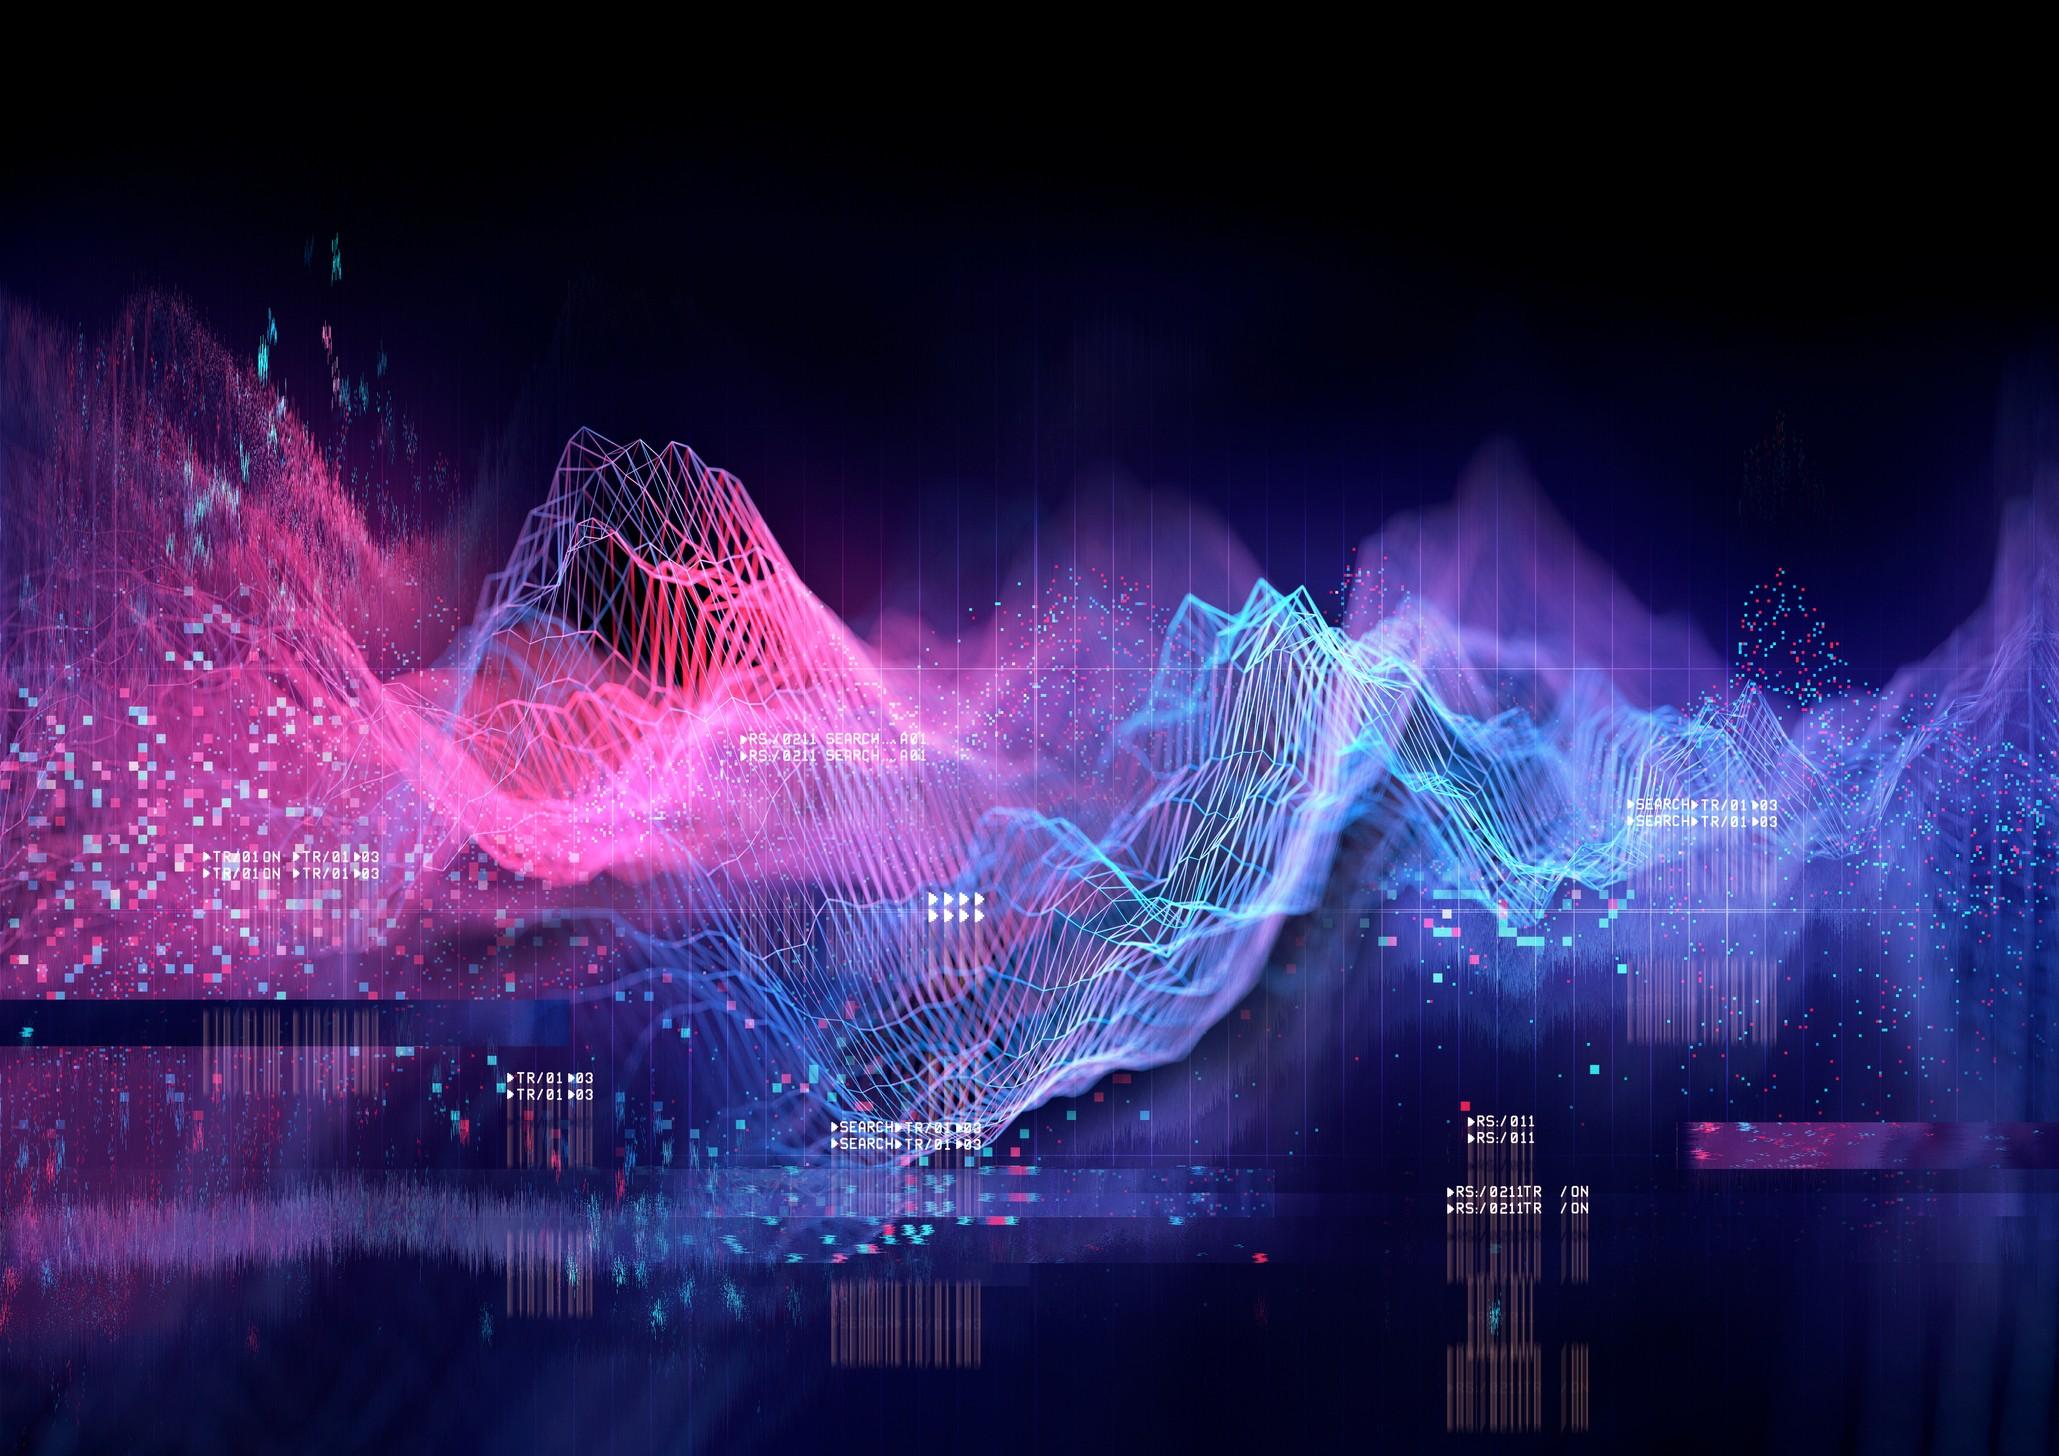 $250,000 Big Data Analysis Challenge